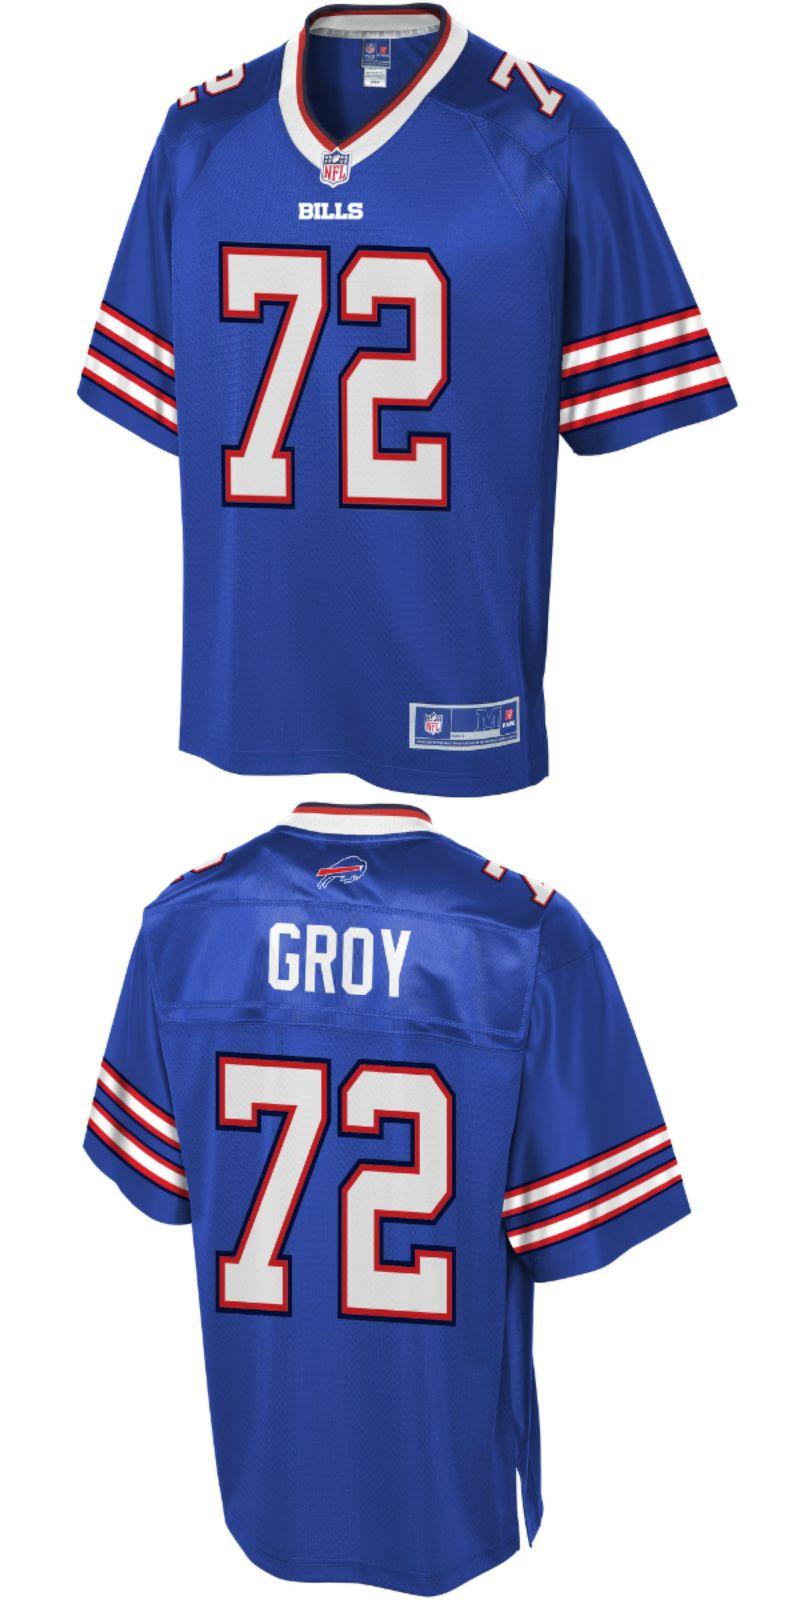 on sale 72825 c1695 Ryan Groy Buffalo Bills NFL Pro Line Player Jersey Royal. Up ...